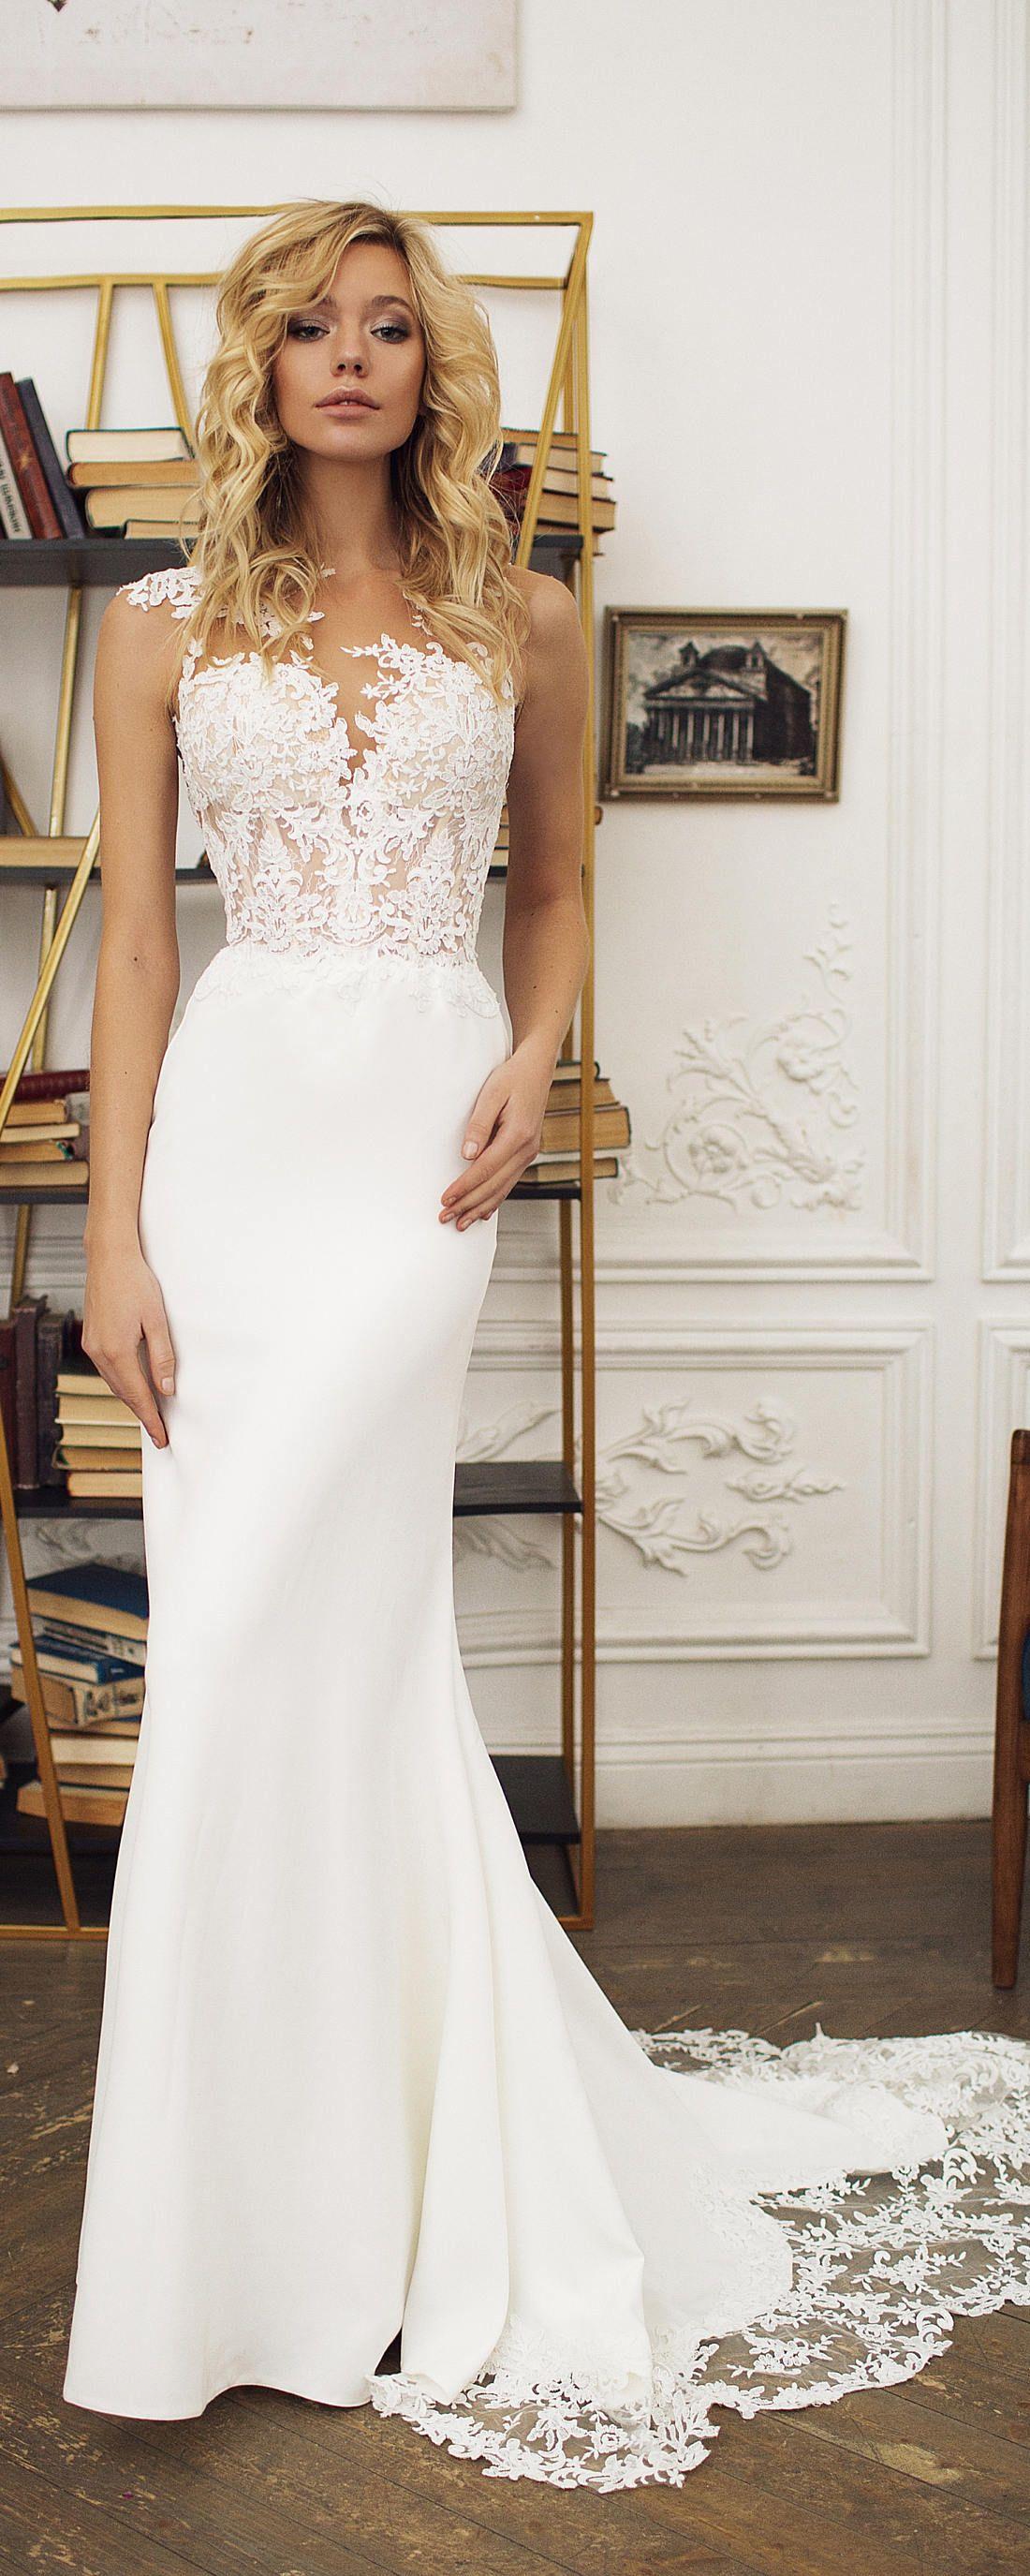 Mermaid Wedding Dress Illusion Back Wedding Dress Kalipso Wedding Dress Preservation Wedding Dresses Wedding Dress Illusion Back